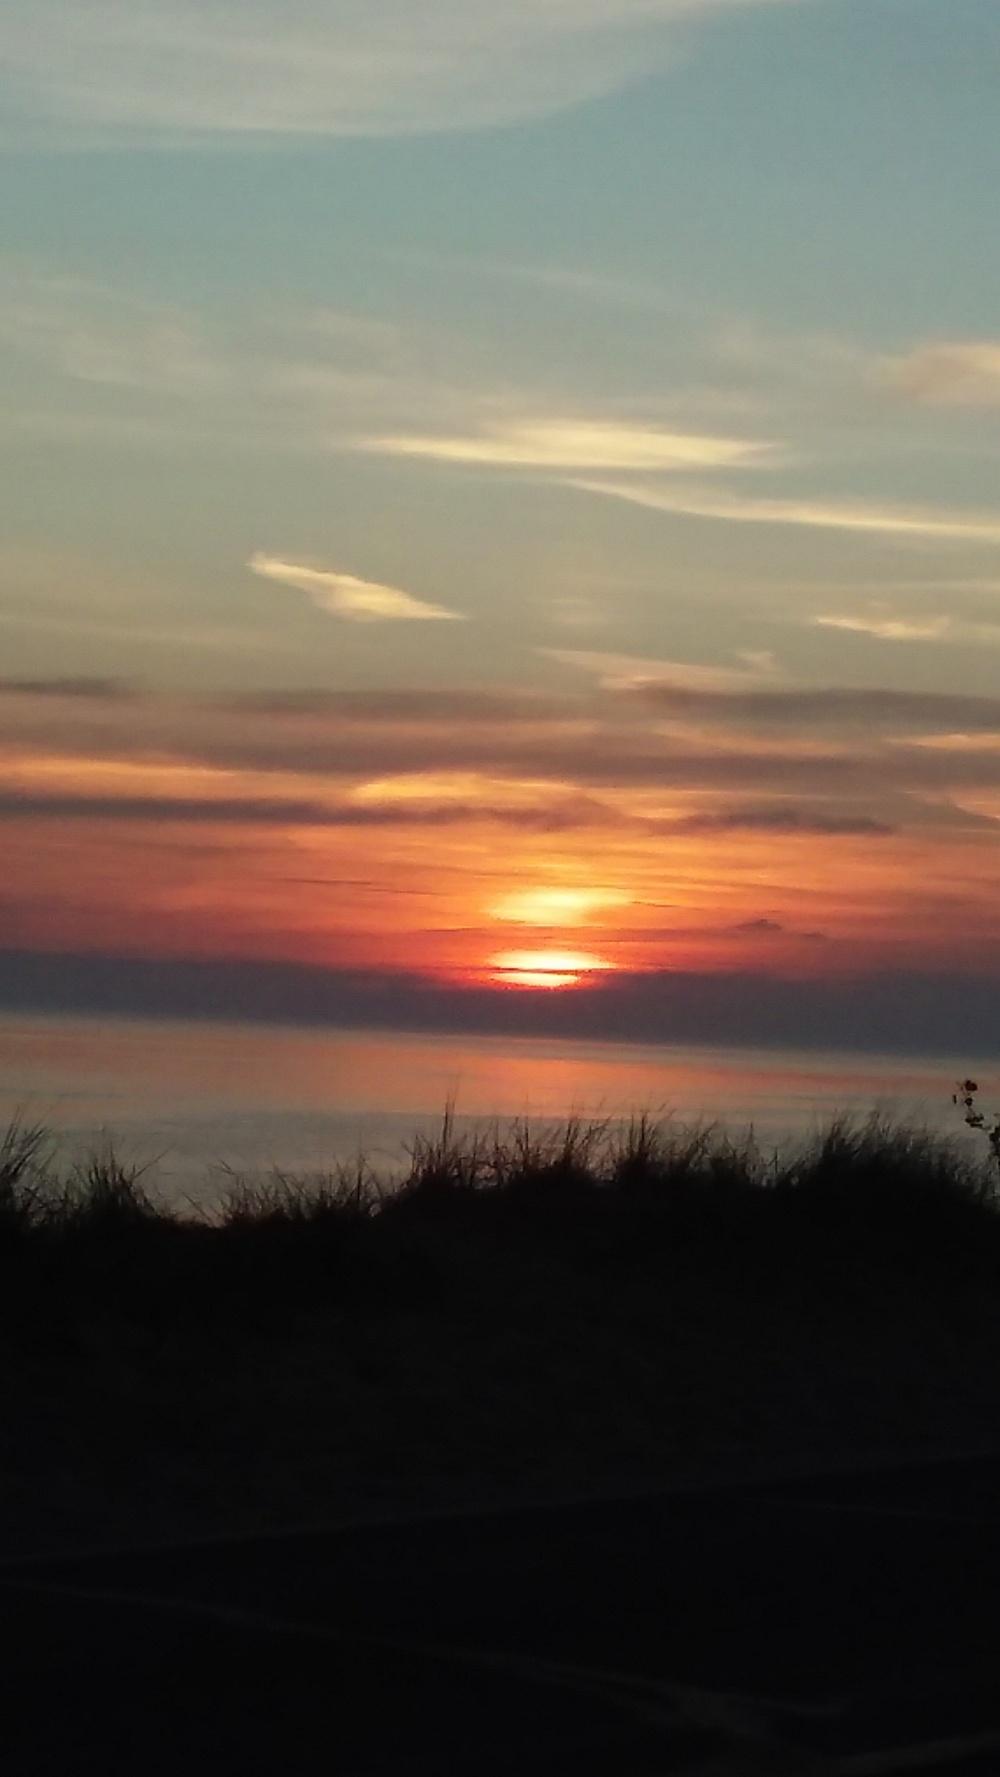 sunset5 052720